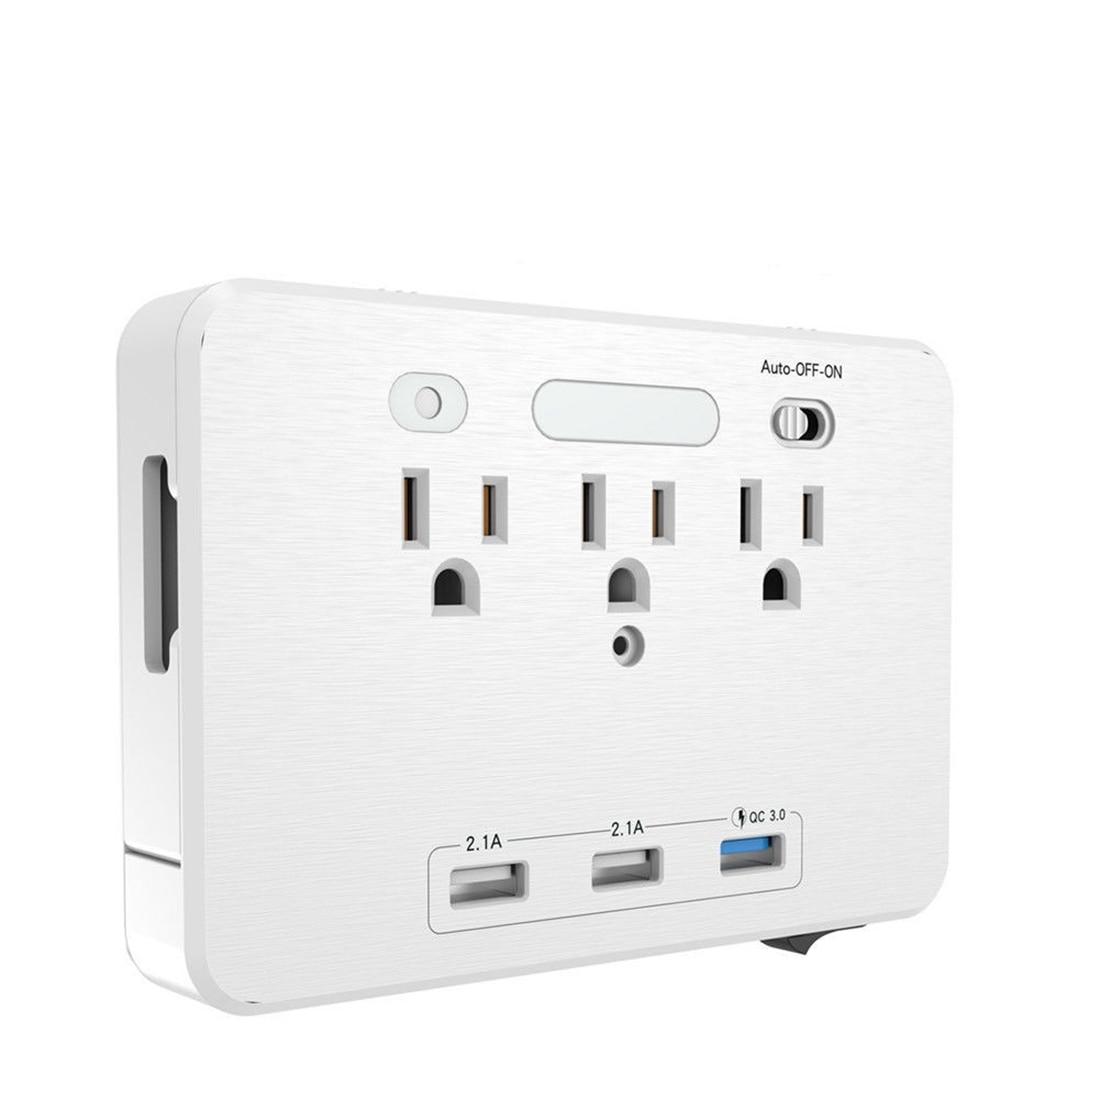 LED Night Light 3 <font><b>USB</b></font> <font><b>Charger</b></font> 3-port AC <font><b>outlet</b></font> <font><b>Wall</b></font> <font><b>outlet</b></font> and phone holder US Plug